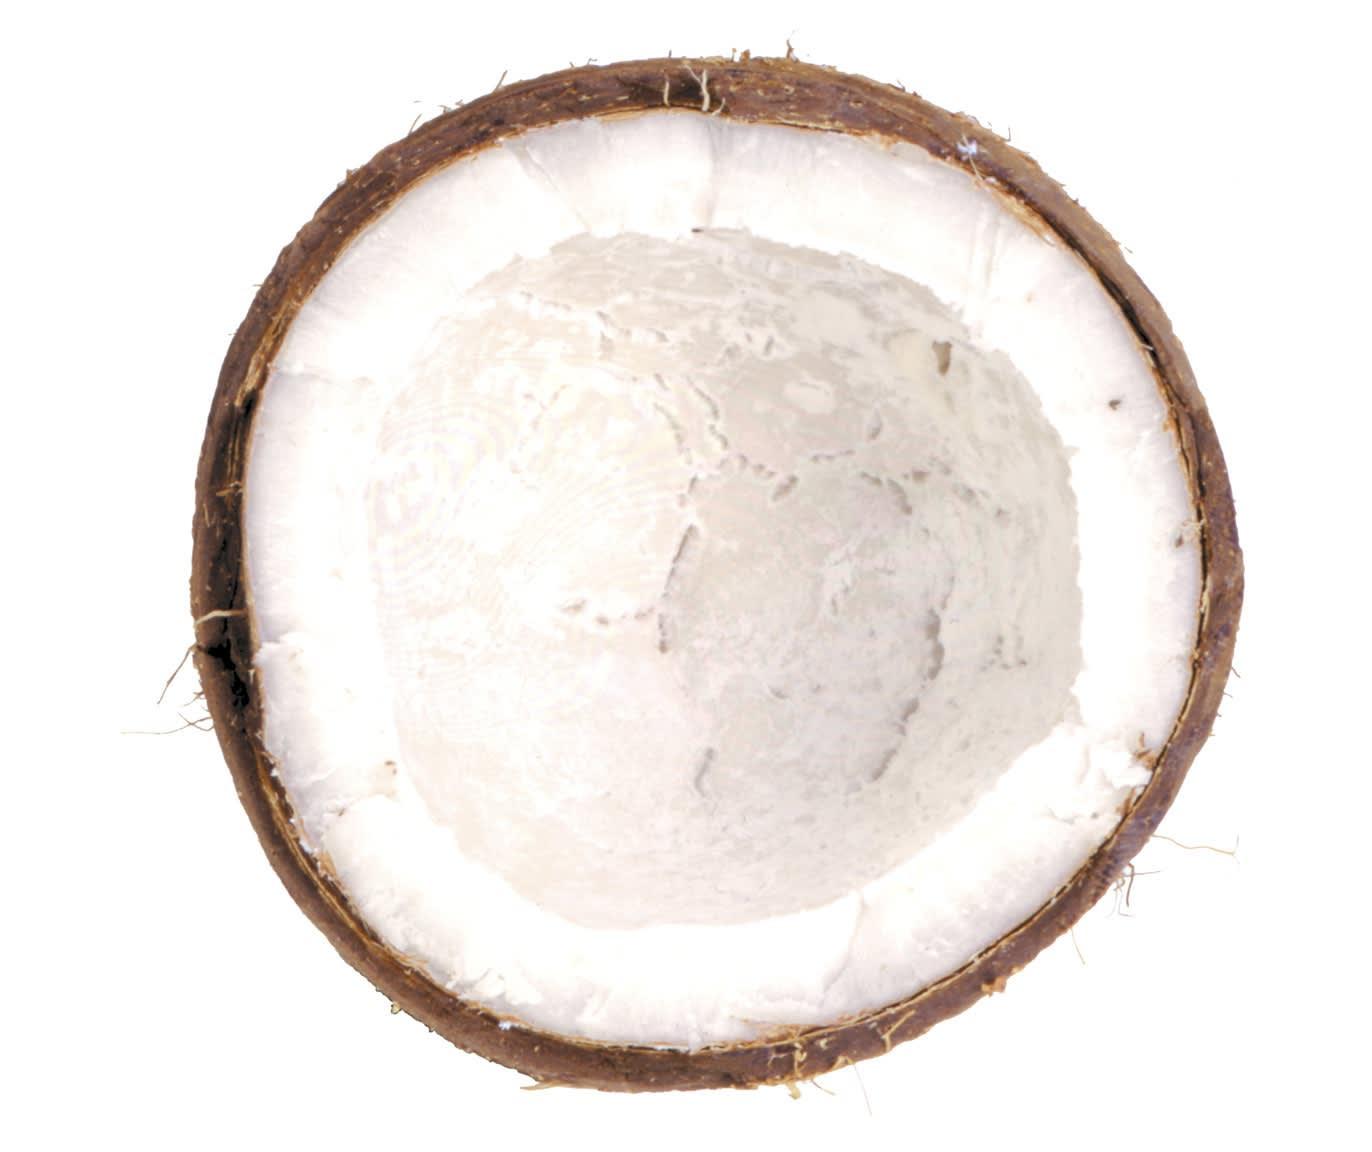 Chuck Ramirez Coconut: White Coconut, 1997, 2002